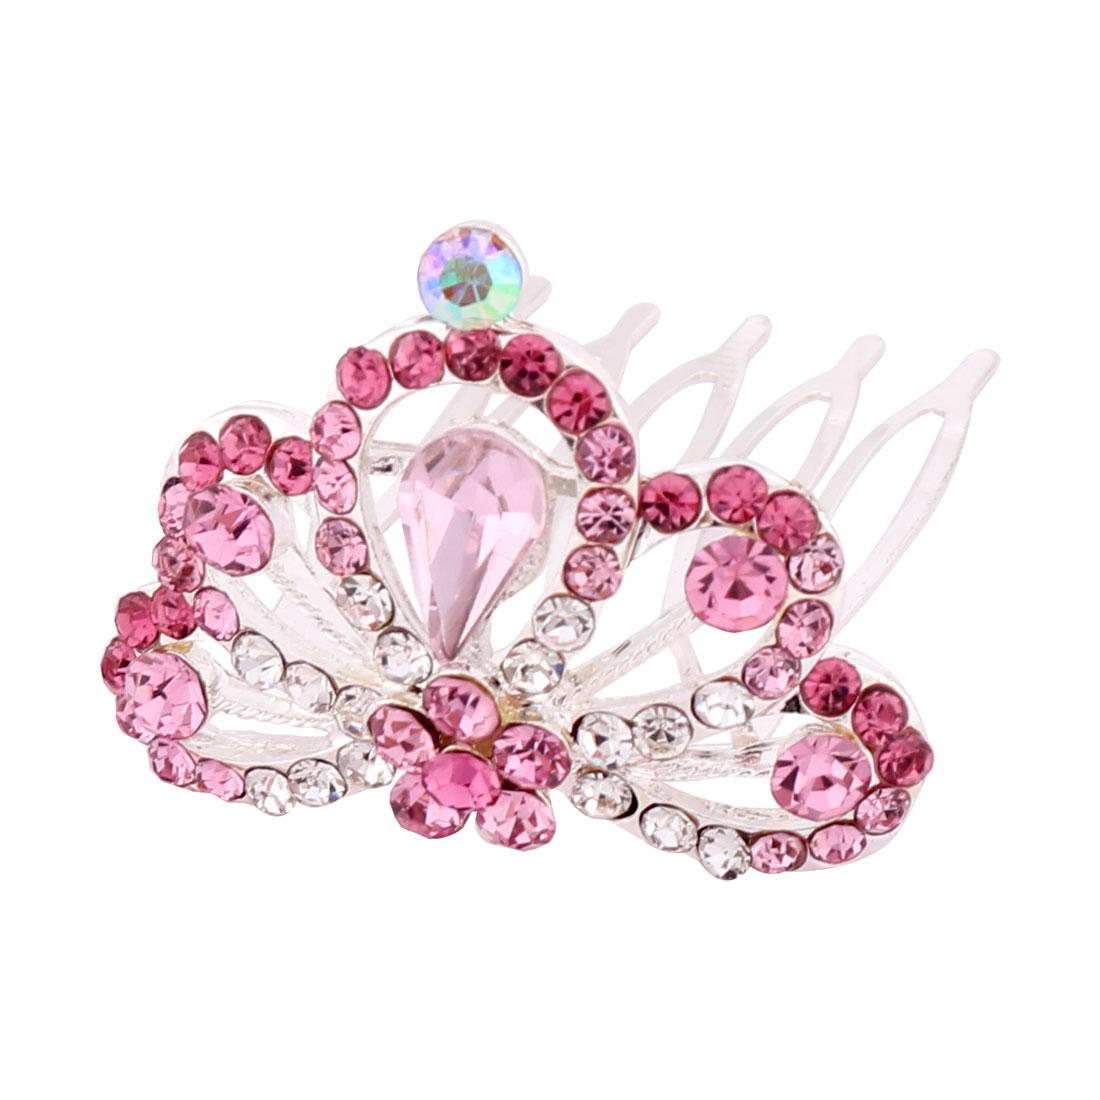 Ladies Wedding Party Plastic Glaring Rhinstone Hair Decoration Crown Pink